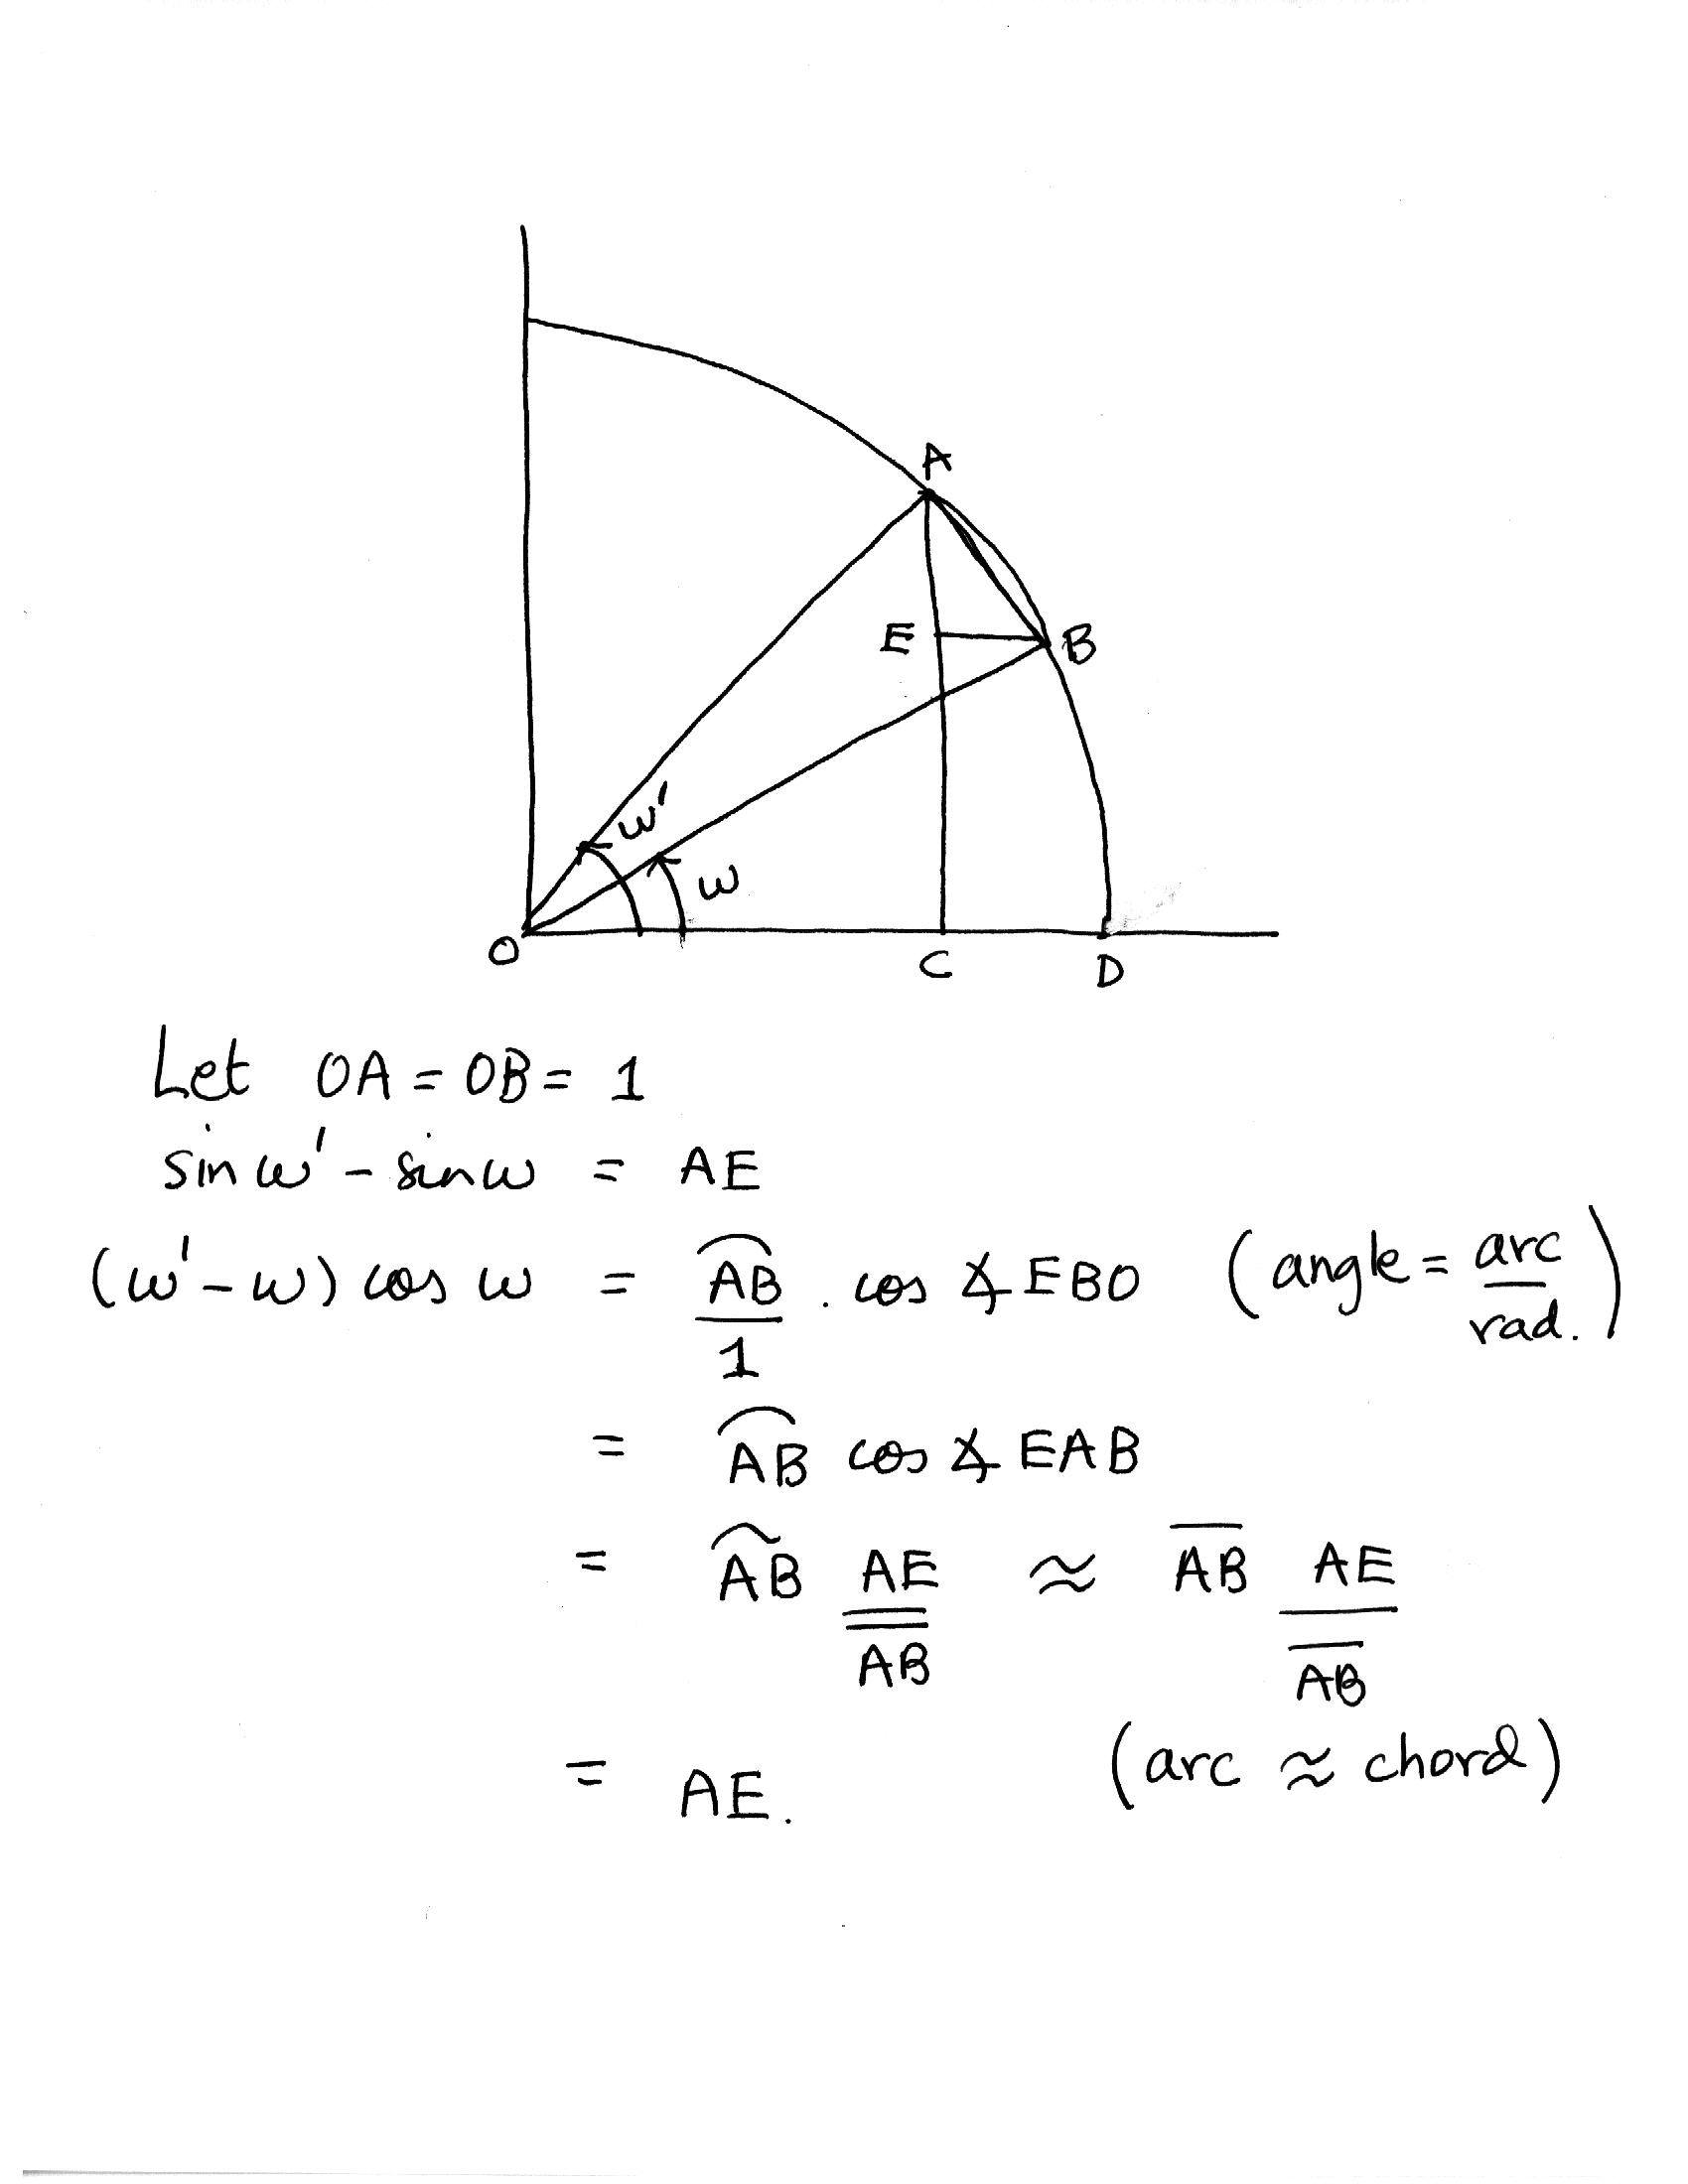 File:Geometric proof manjula10thcentury.jpg - Wikimedia Commons